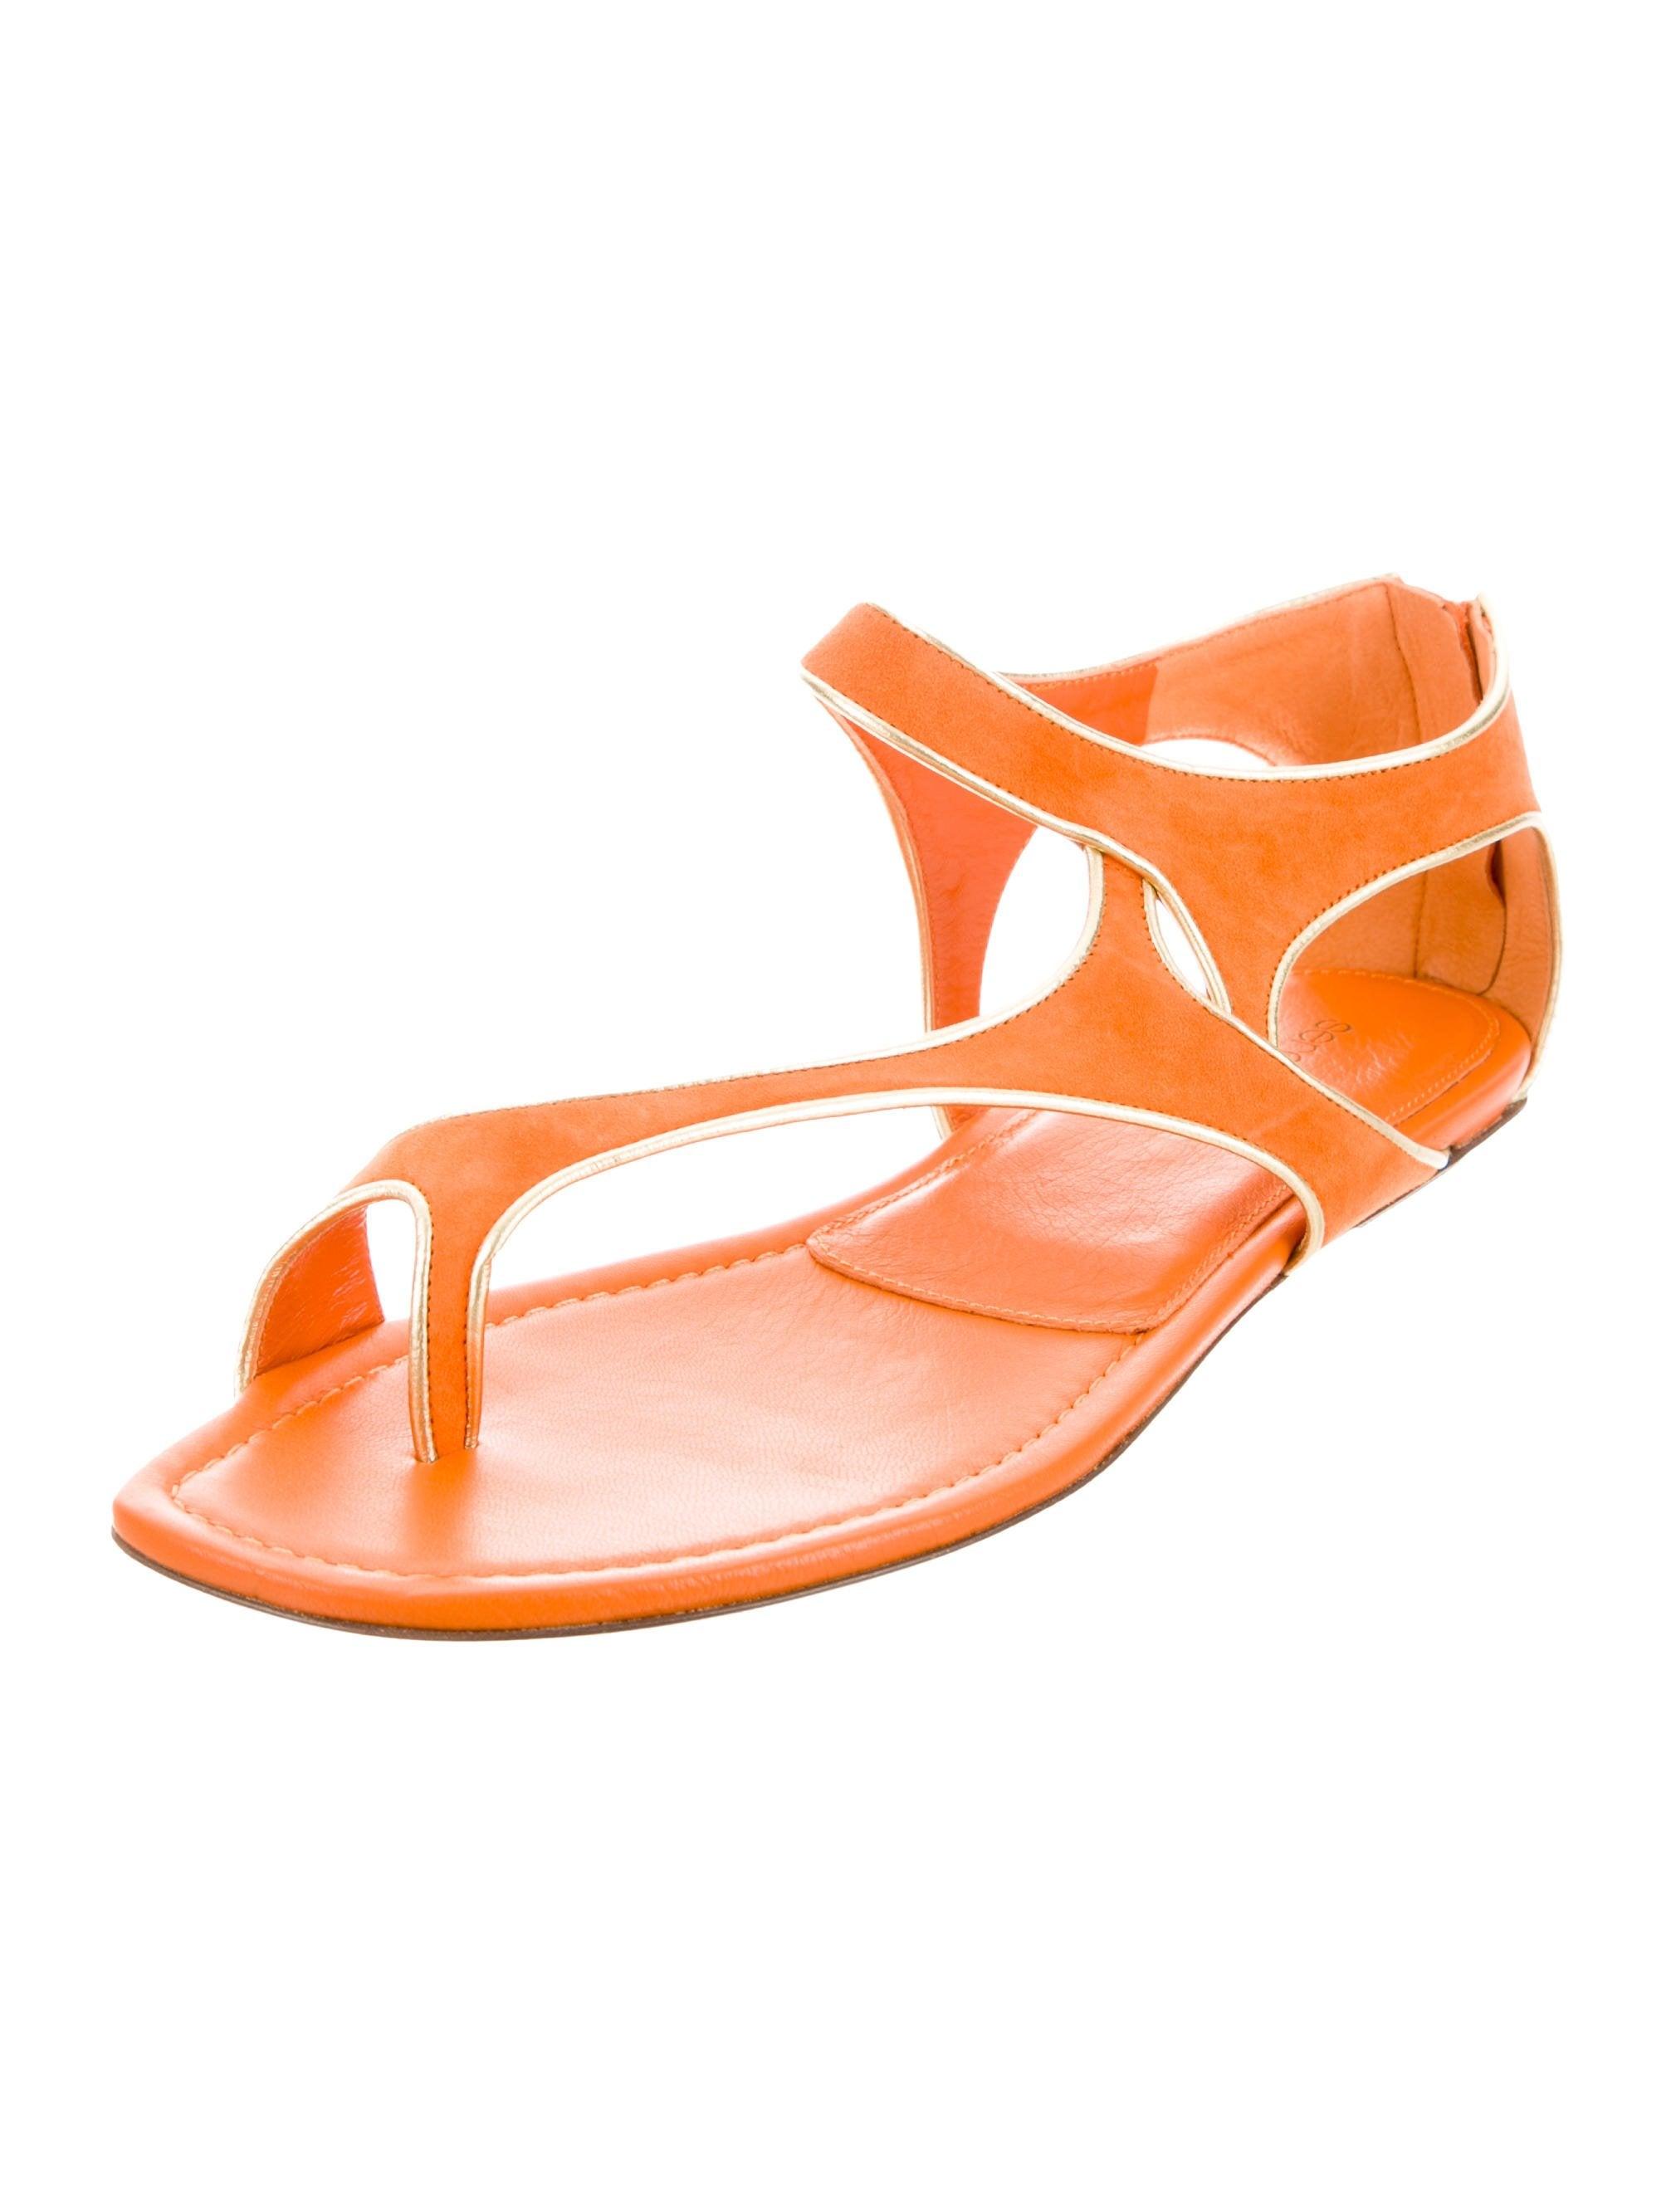 Sergio Rossi Marley Metallic Suede Sandals w/ Tags discount wide range of CErv3UTYh5